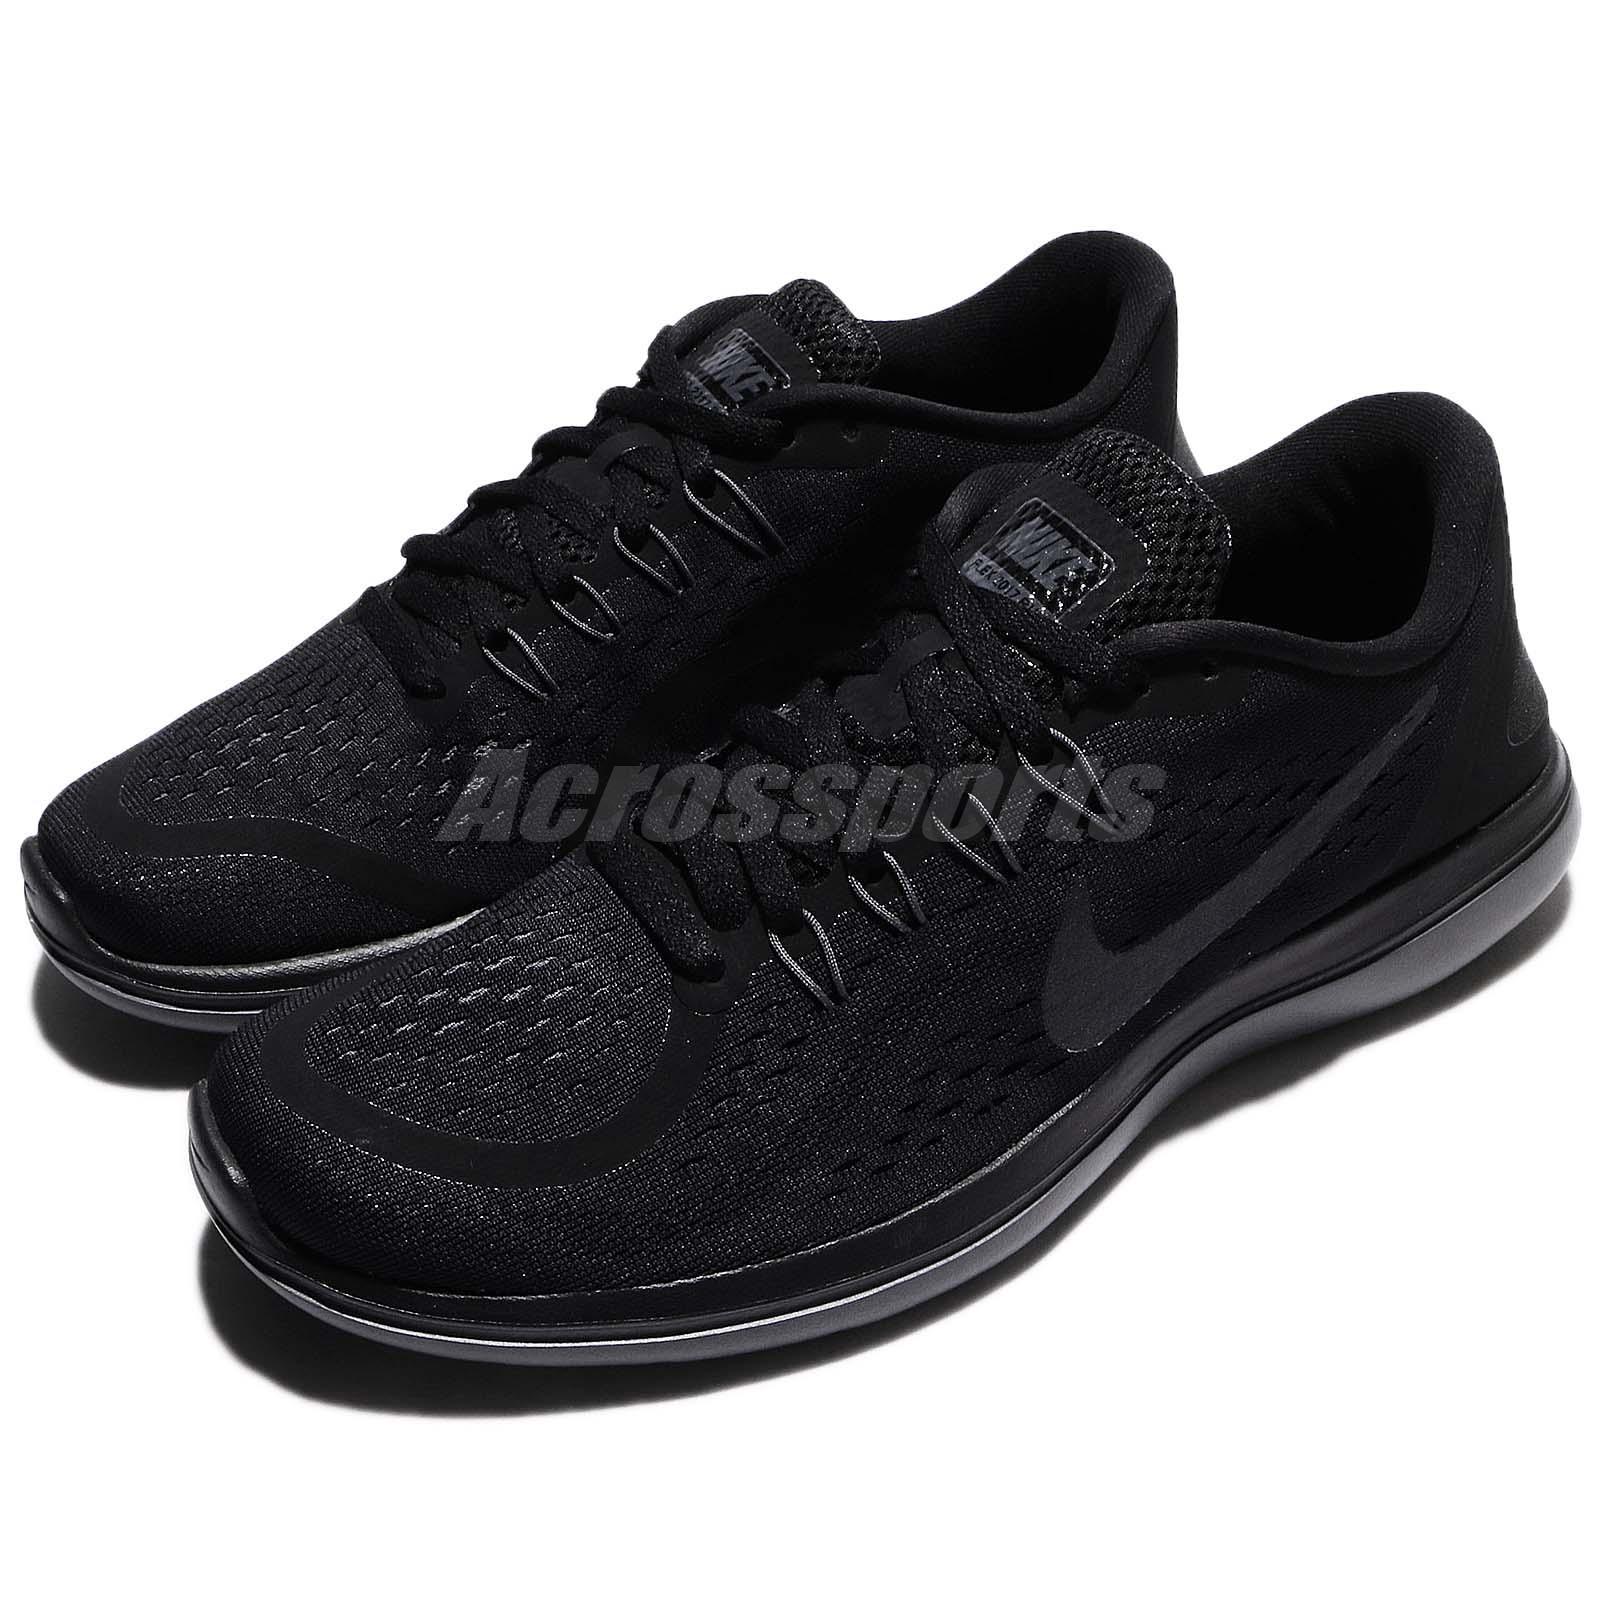 Details about Nike Flex 2017 RN Run Black Men Running Shoes Sneakers  898457-005 e44d770ceac97